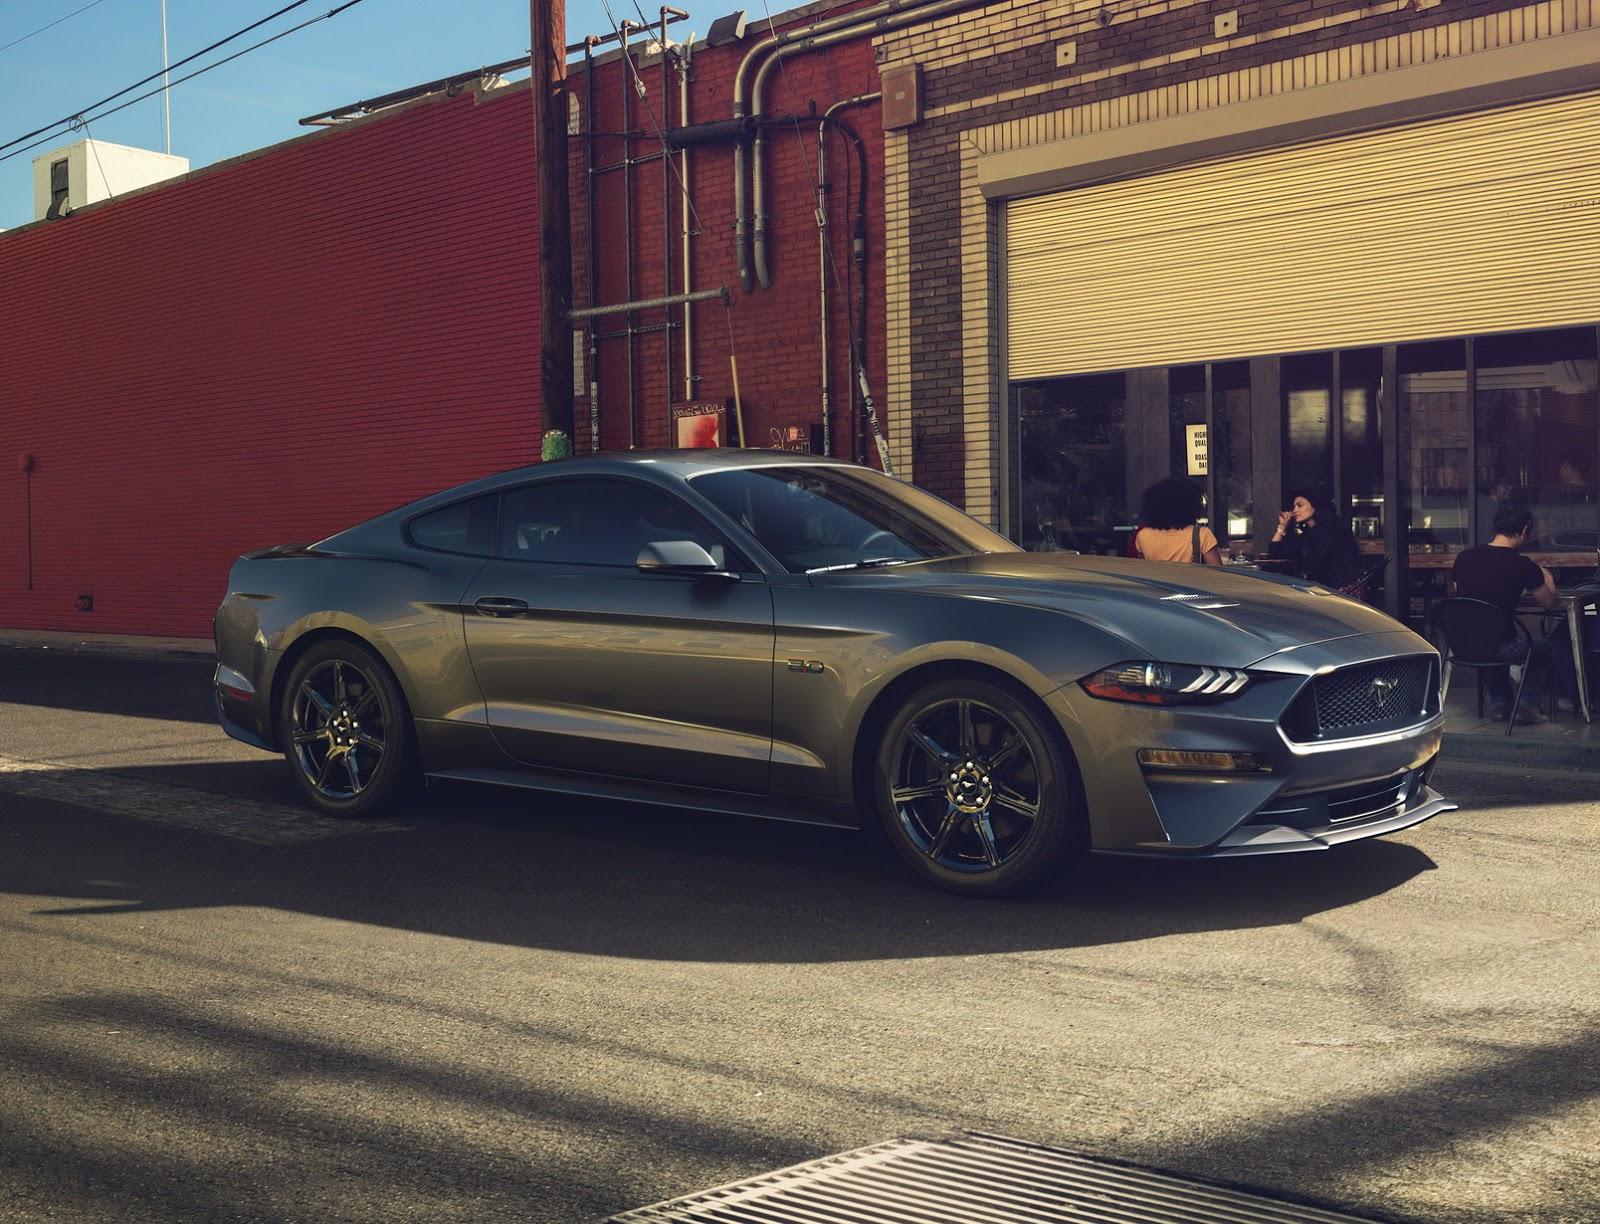 New-Mustang-18-15.jpg